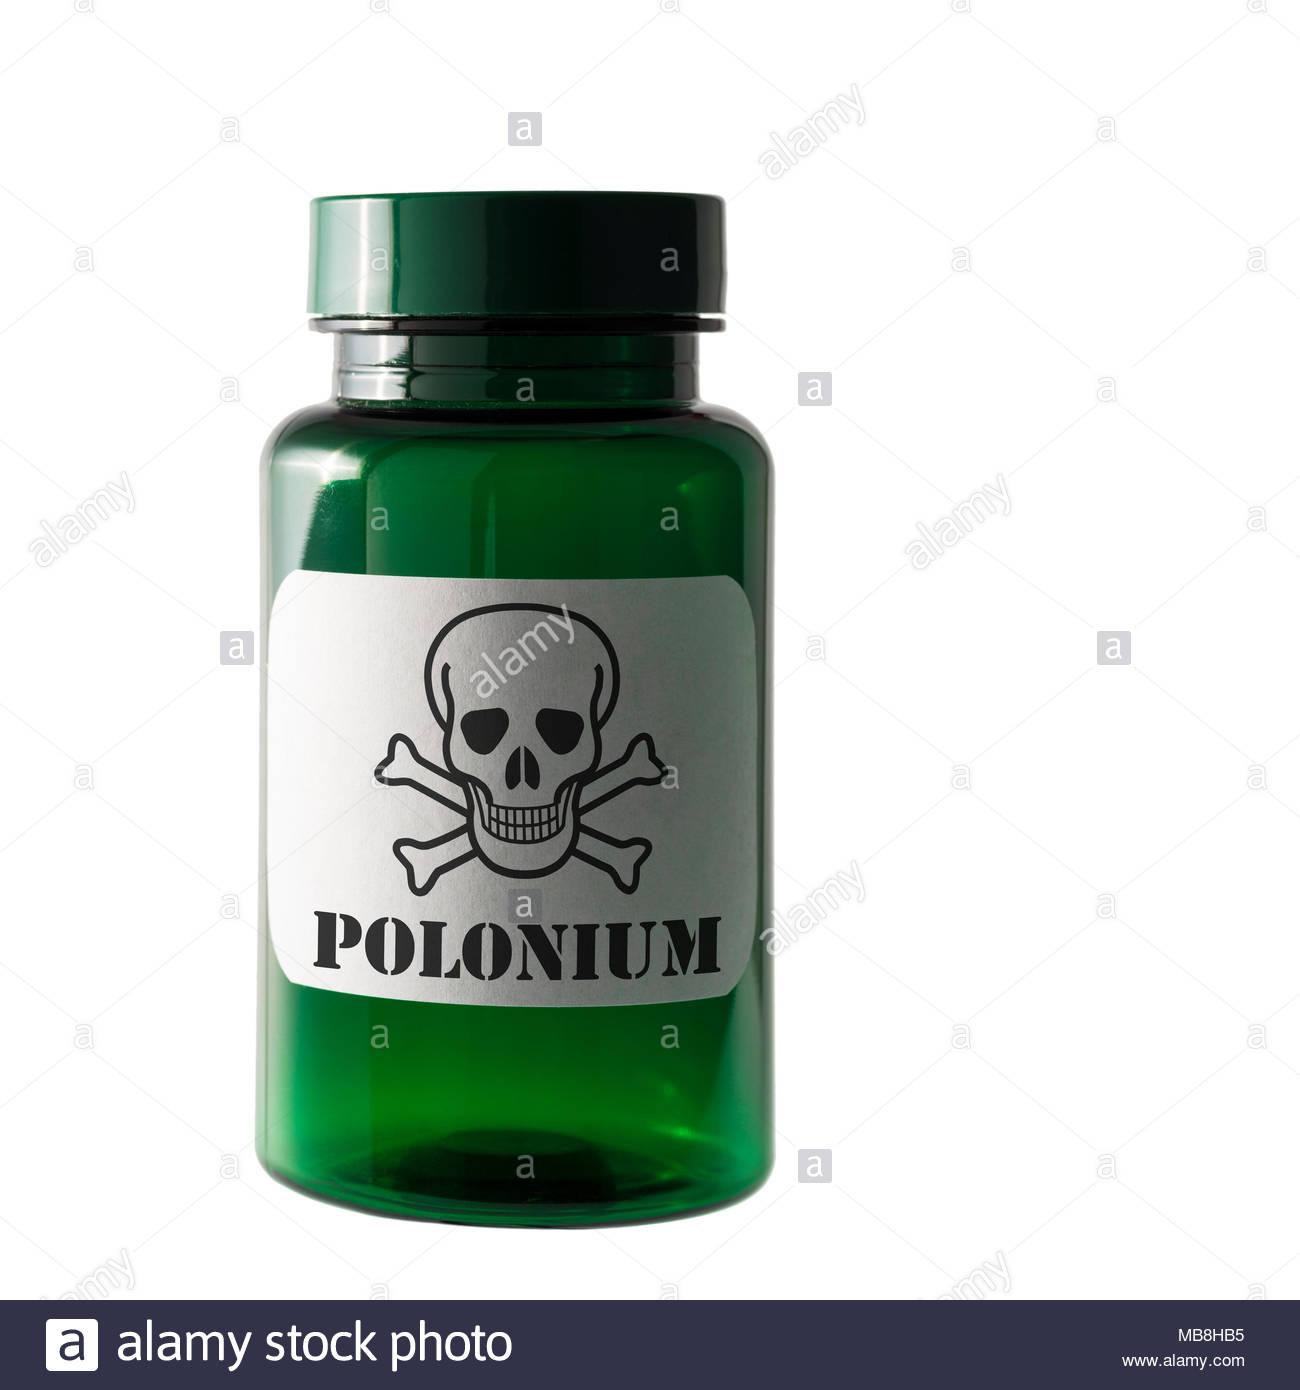 polonium element stock photos polonium element stock images alamy